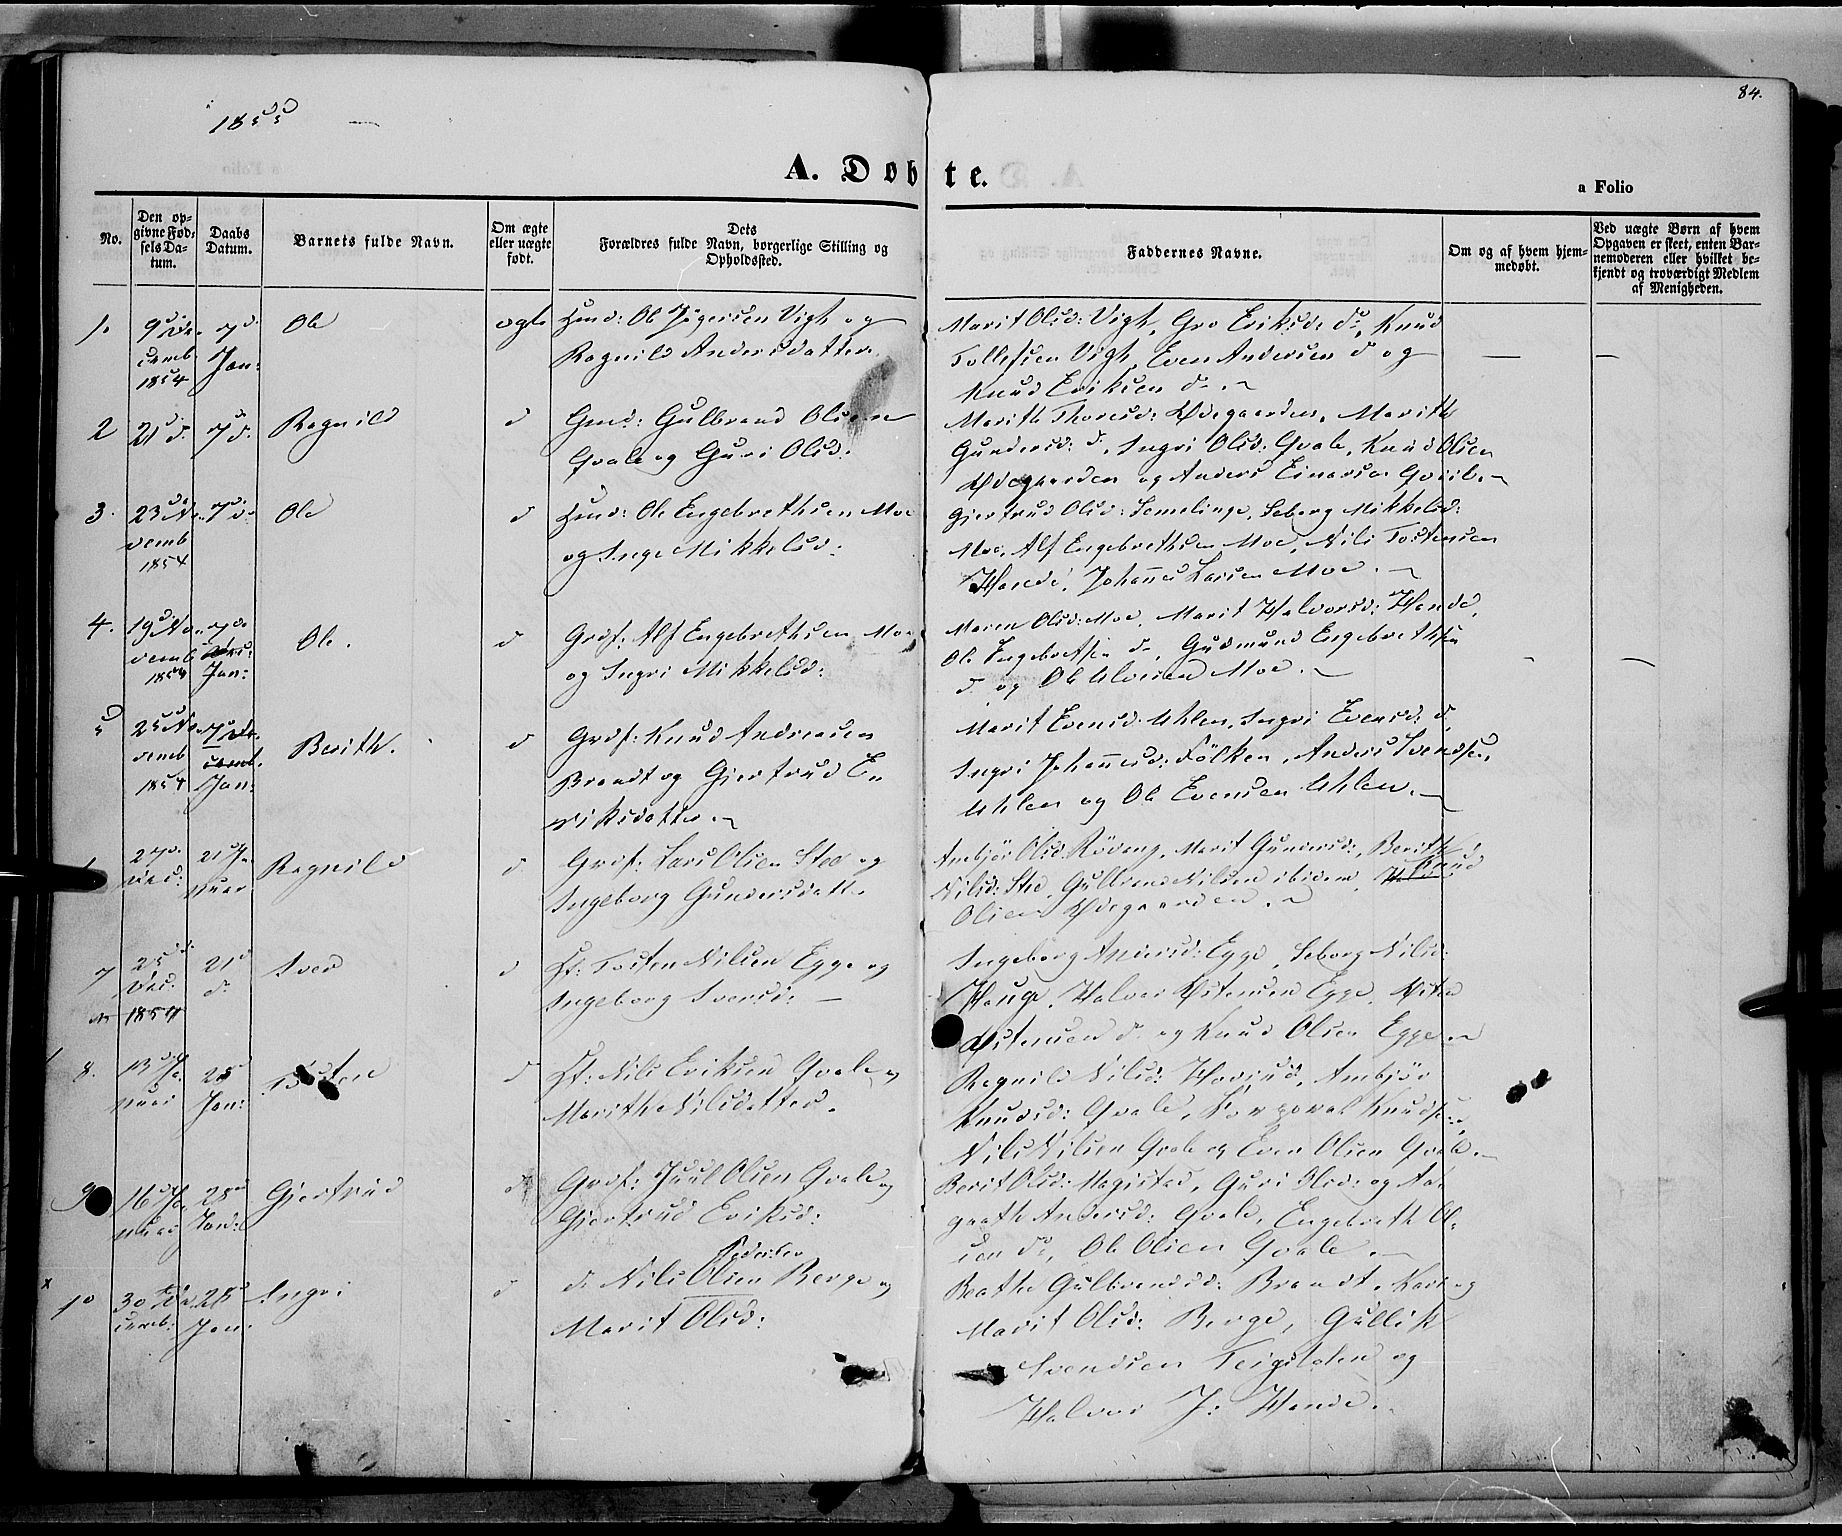 SAH, Vestre Slidre prestekontor, Ministerialbok nr. 1, 1844-1855, s. 84